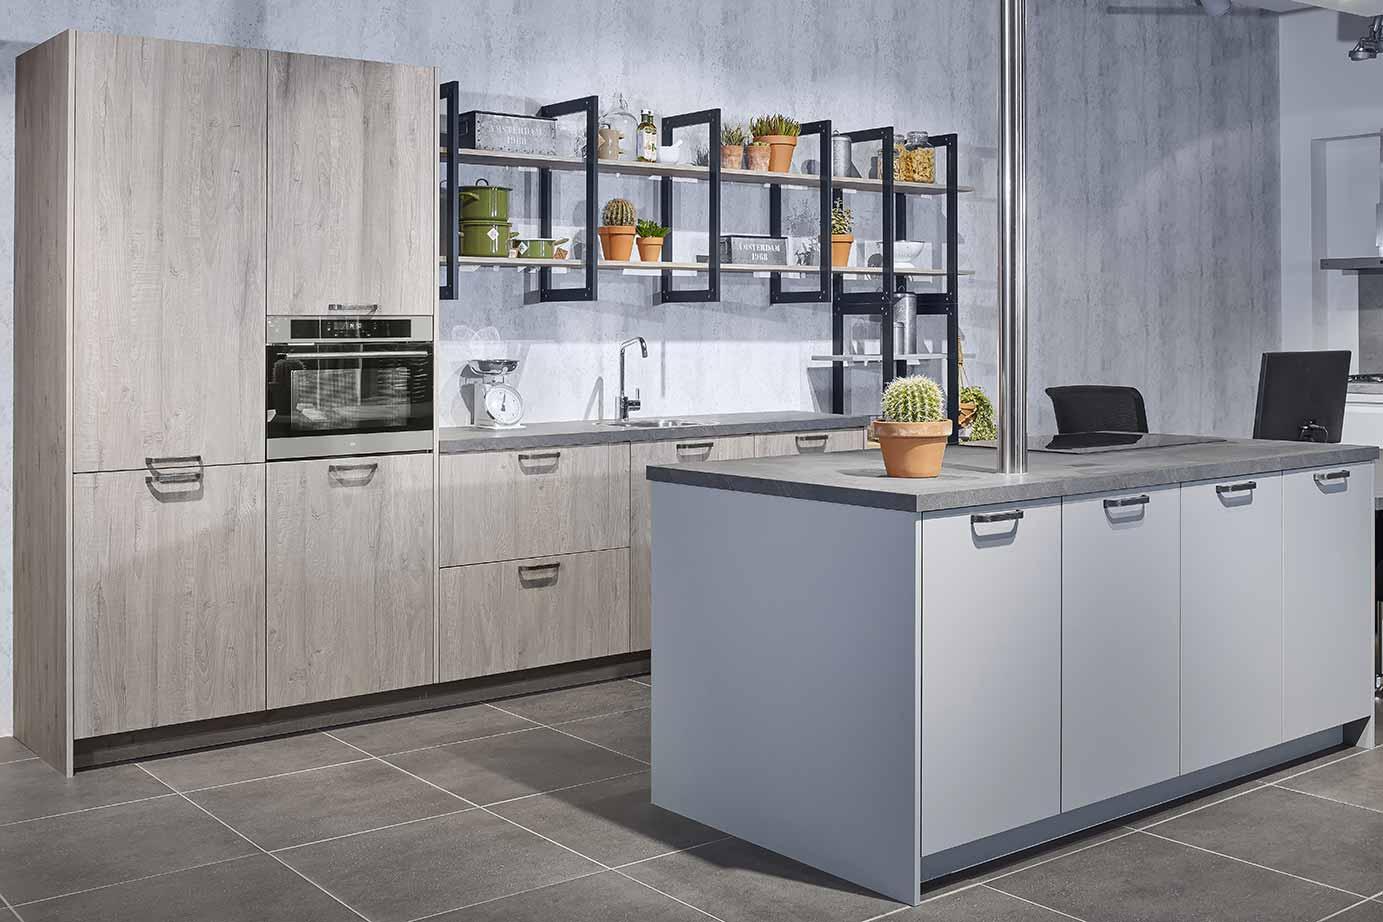 Klein Keuken Industriele : Industriële keuken grove robuuste en stoere materialen db keukens